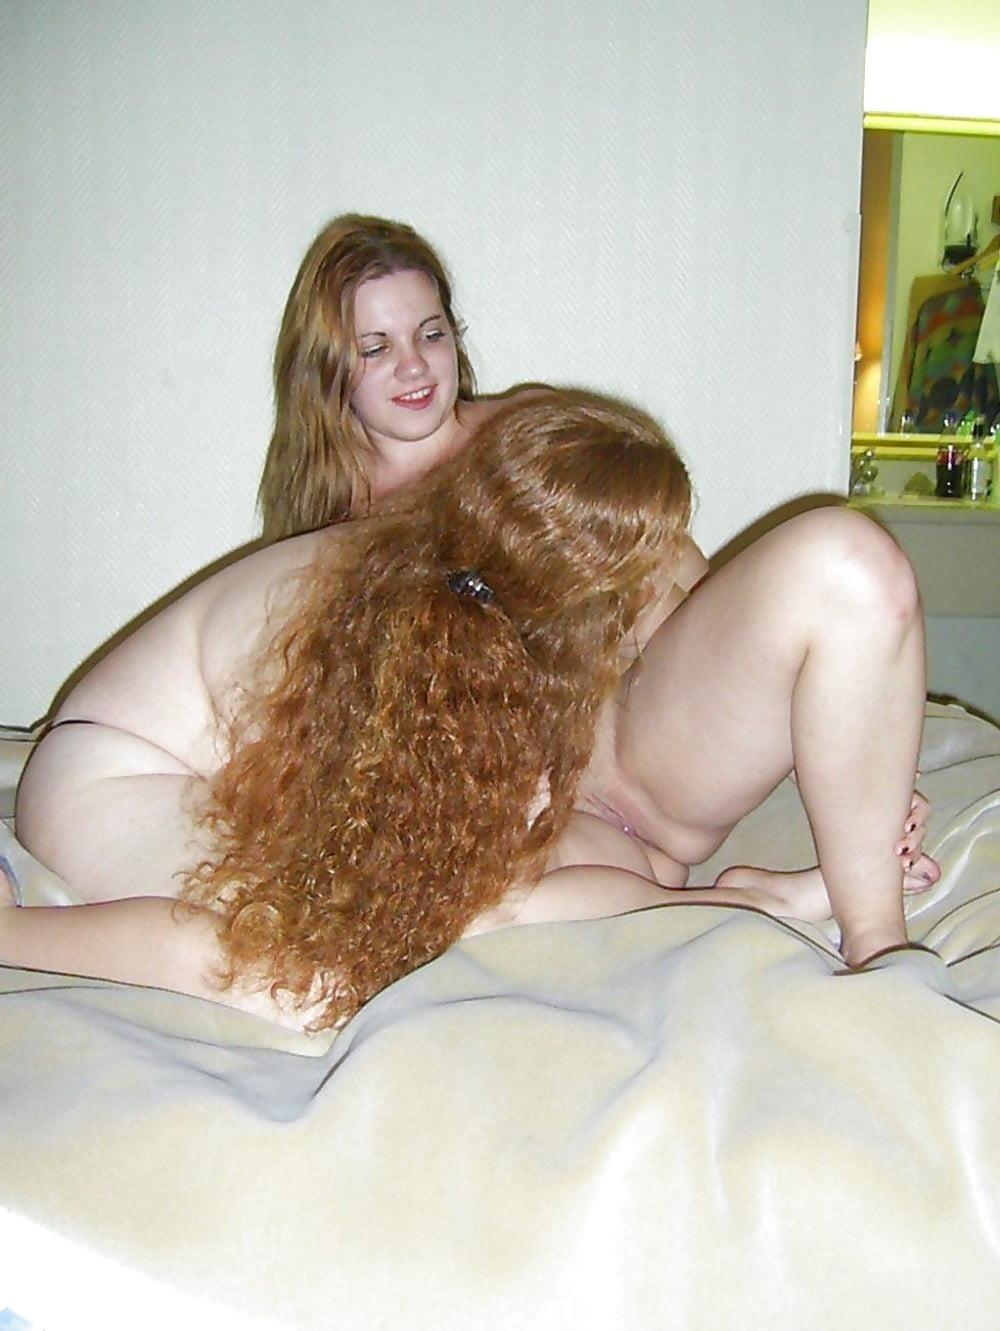 Chubby lesbian pics-3212